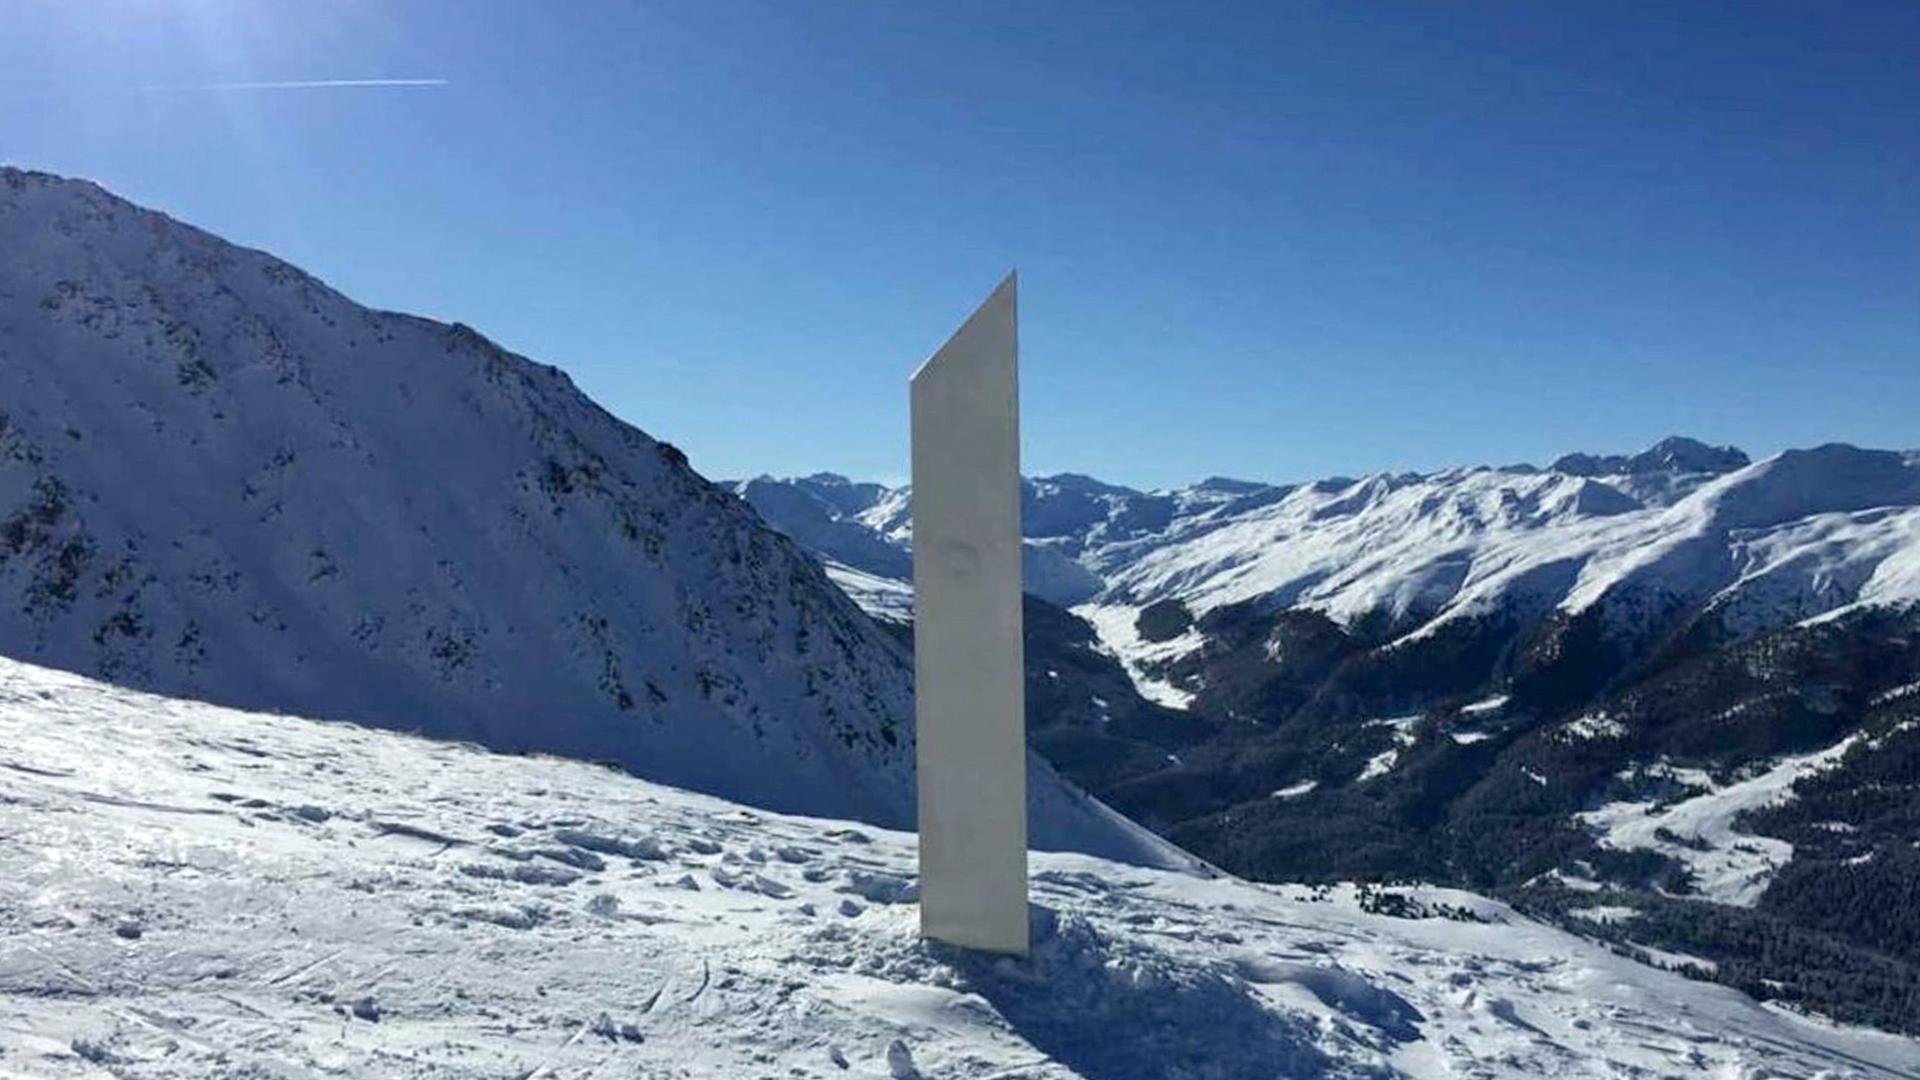 Mysterious monolith appears in Austrian ski area - Zenger News